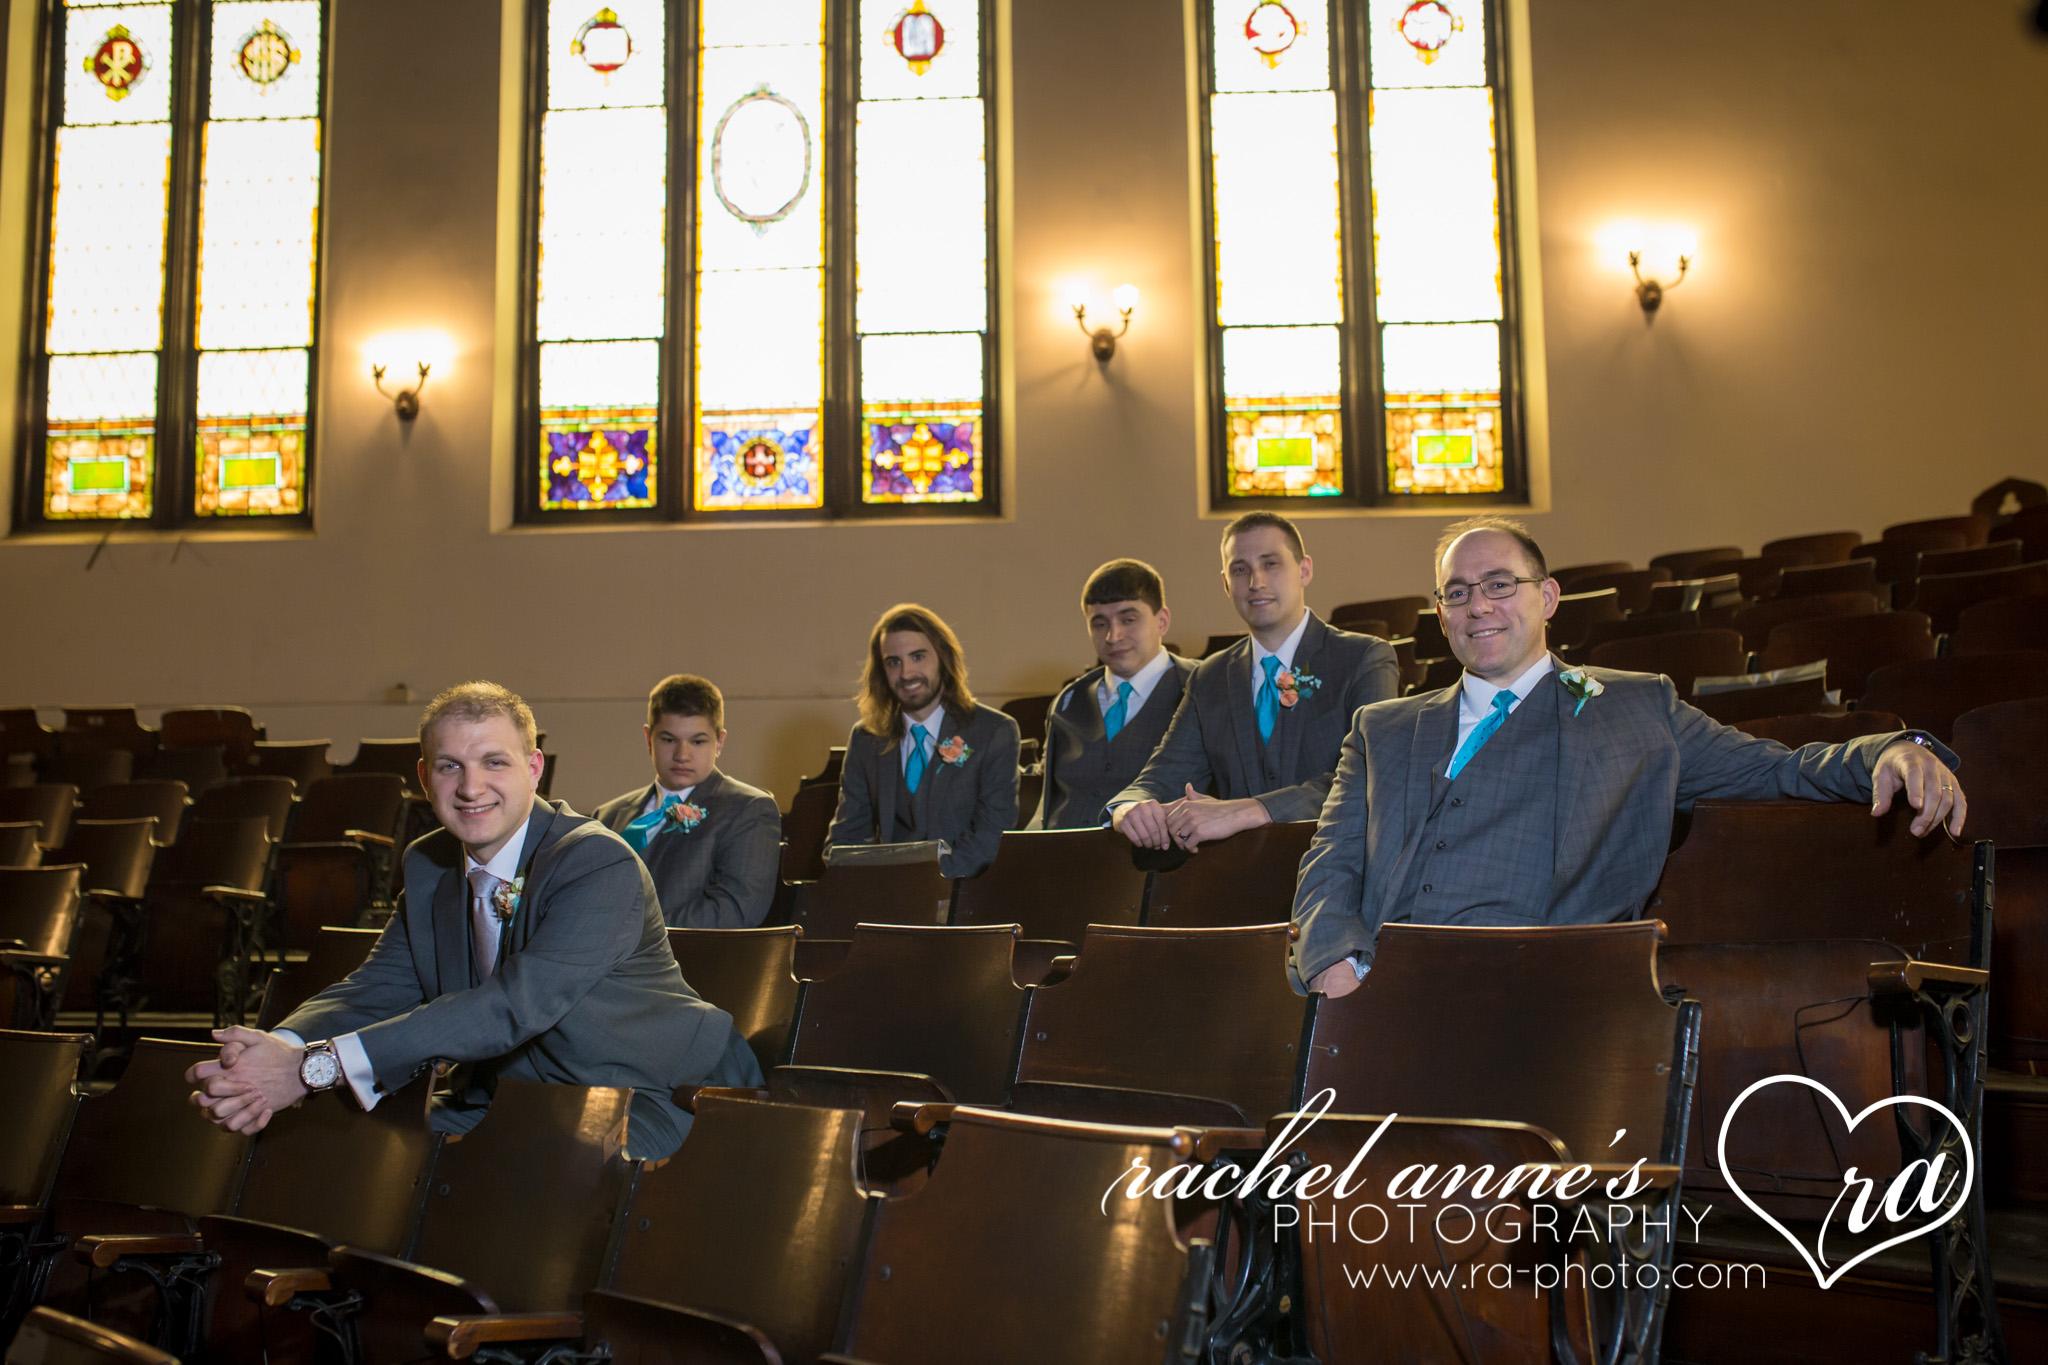 015-JKS-WEDDINGS-THE-FRANKLIN-PA.jpg